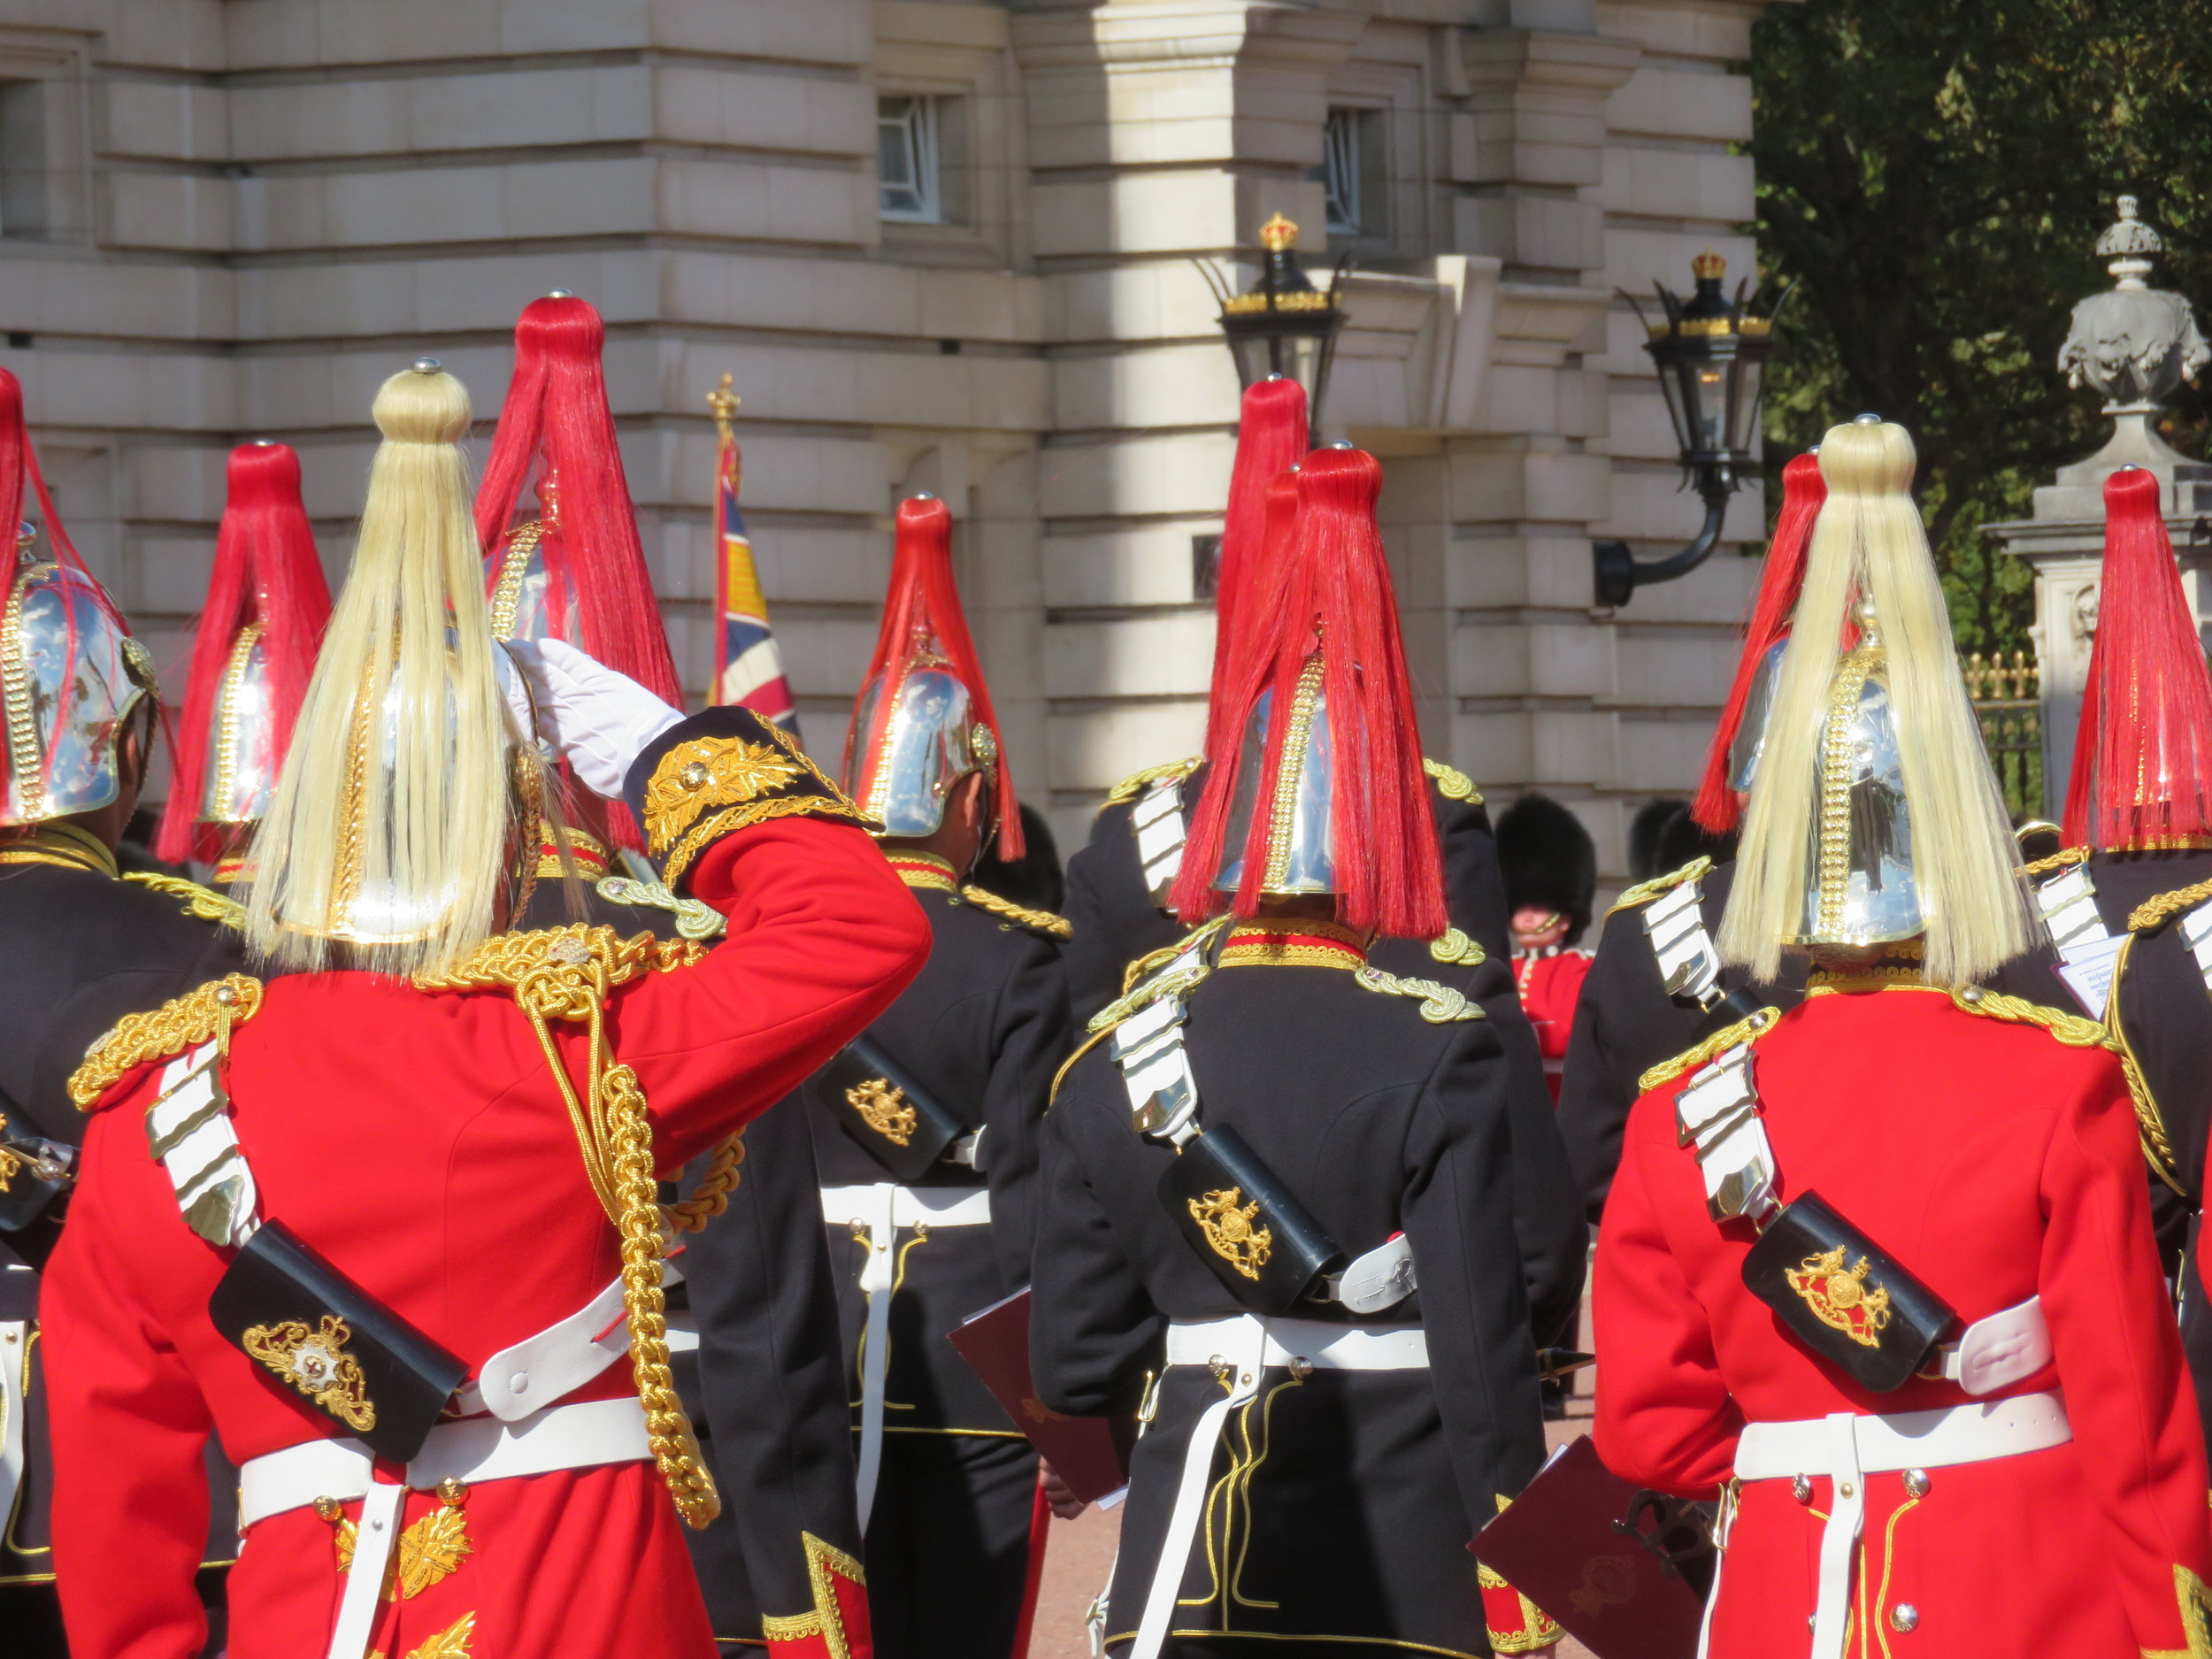 london1_identifying the uniforms.JPG